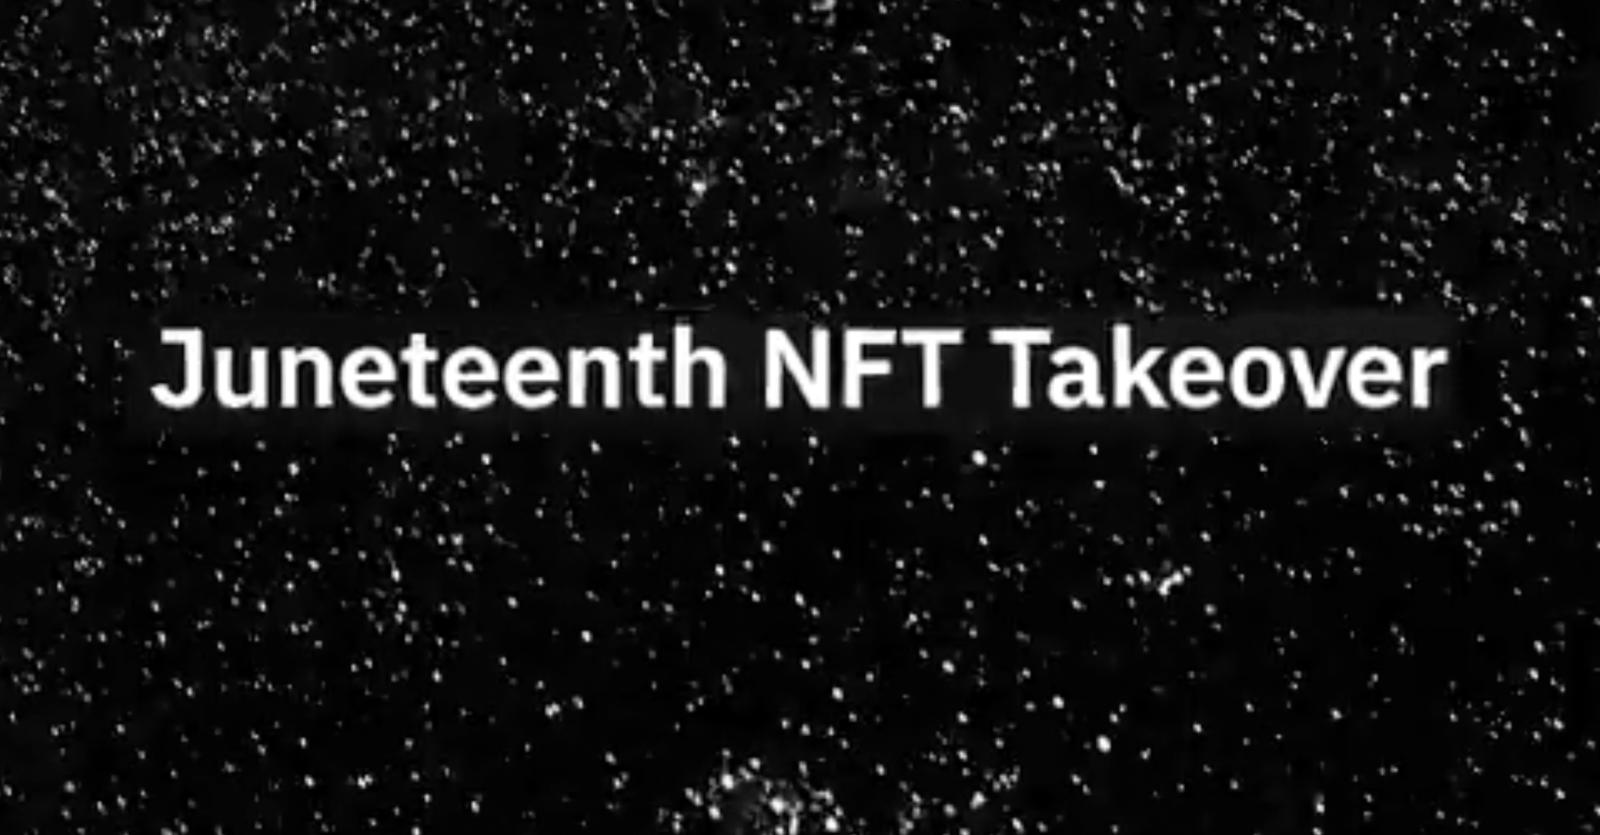 Juneteenth NFT Takeover